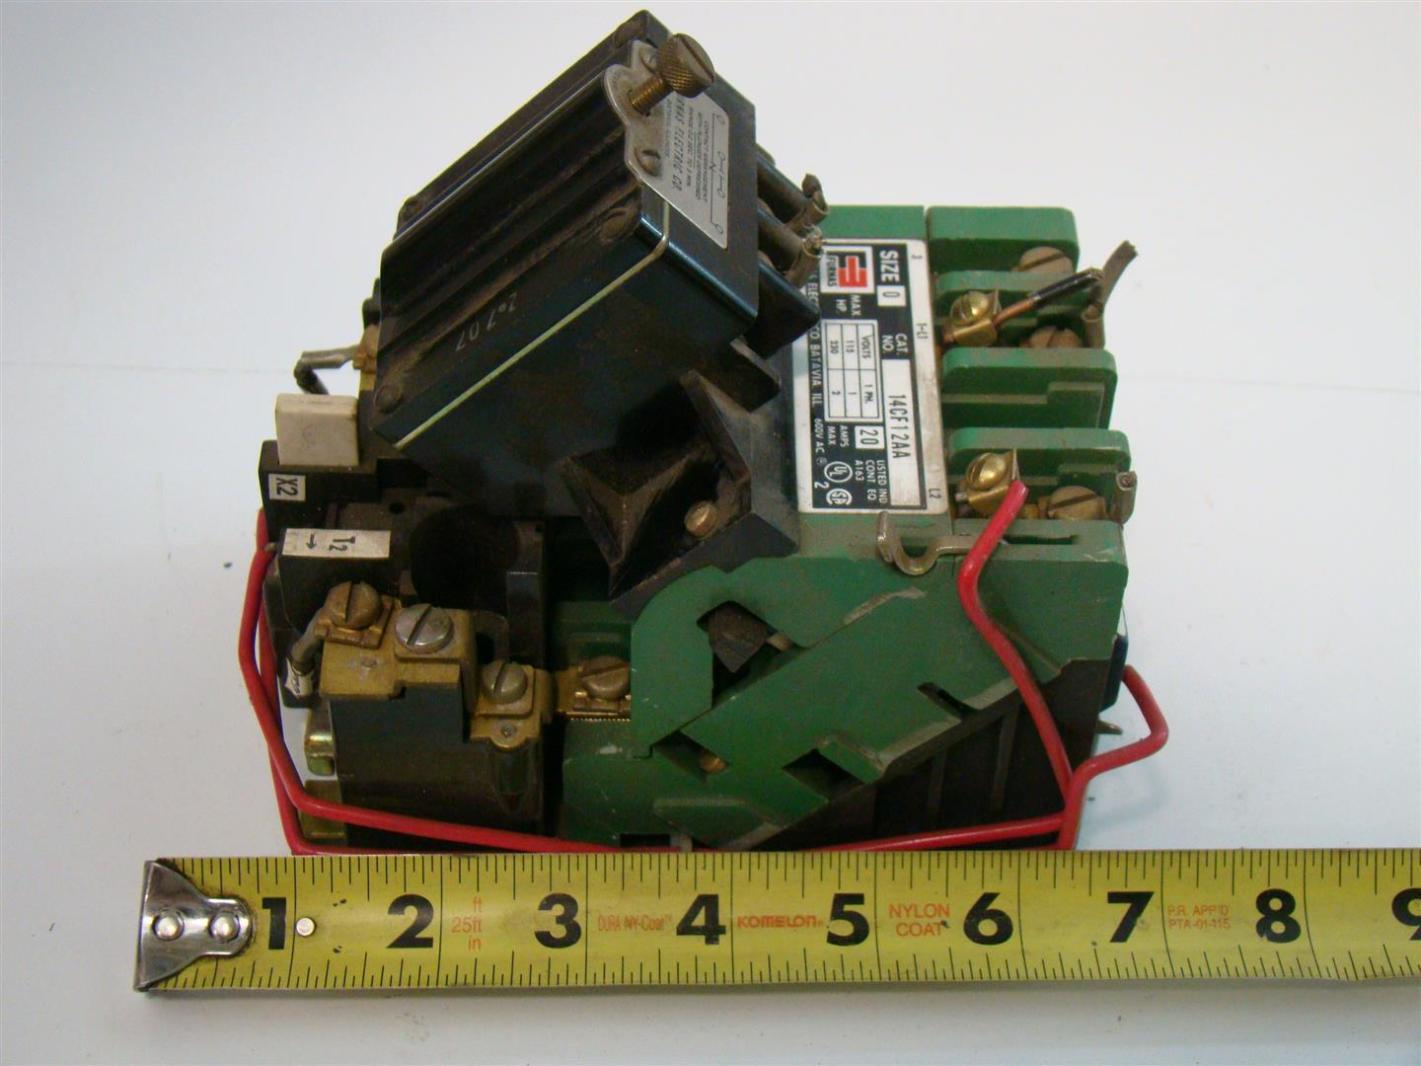 Furnas electric size 0 motor starter 115 230v 1ph 20amps Furnas motor starter